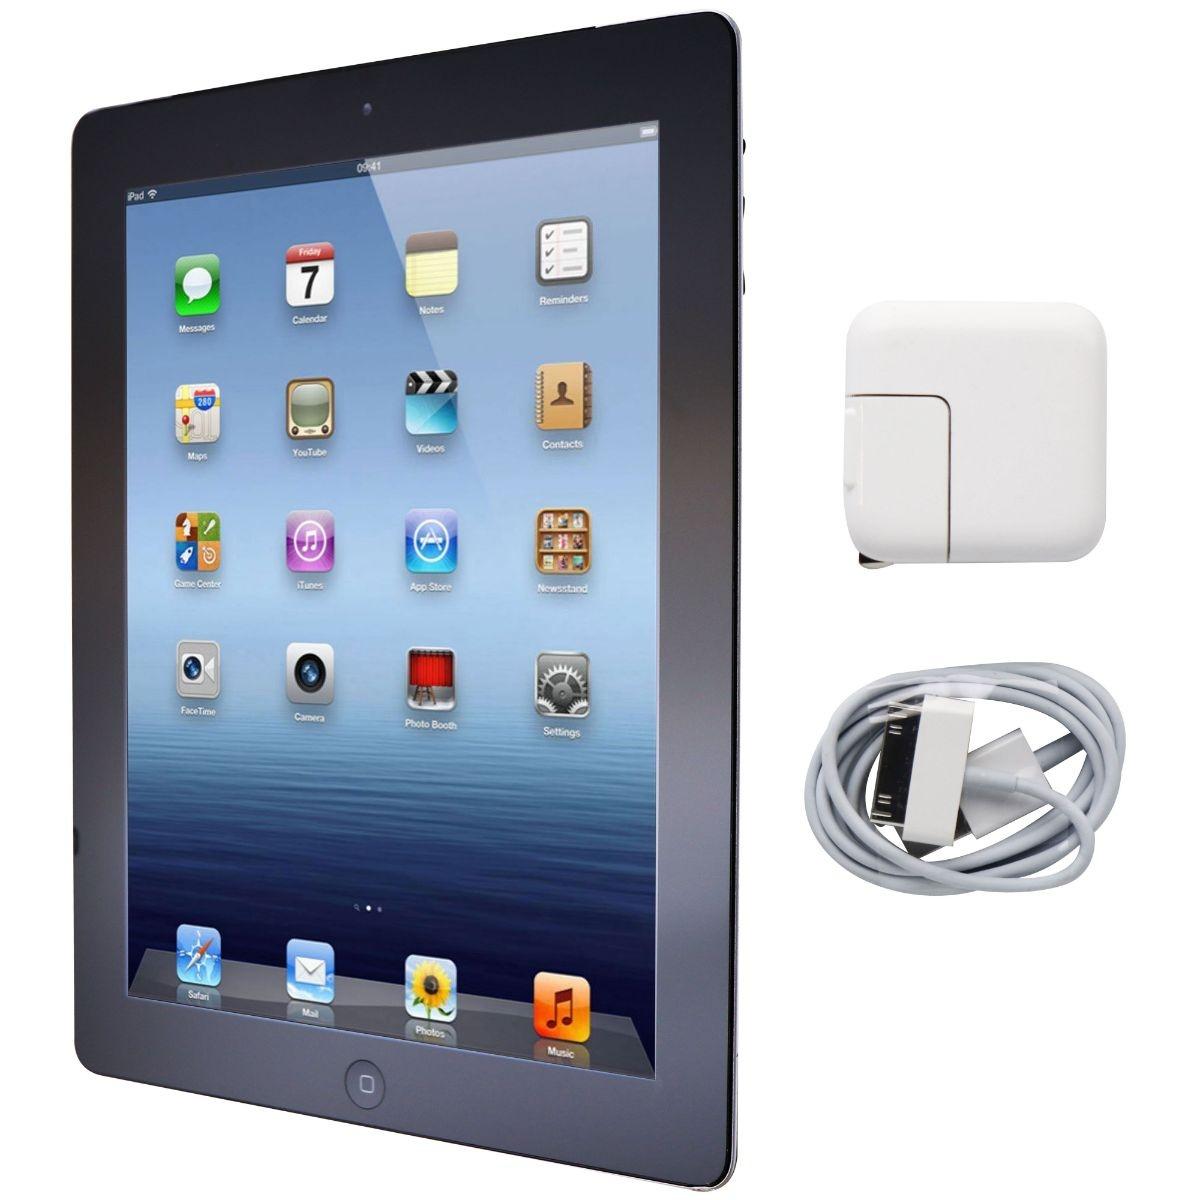 Apple iPad 9.7 (2nd Gen) Tablet A1397 (GSM Unlocked + Verizon) - 16GB / Black